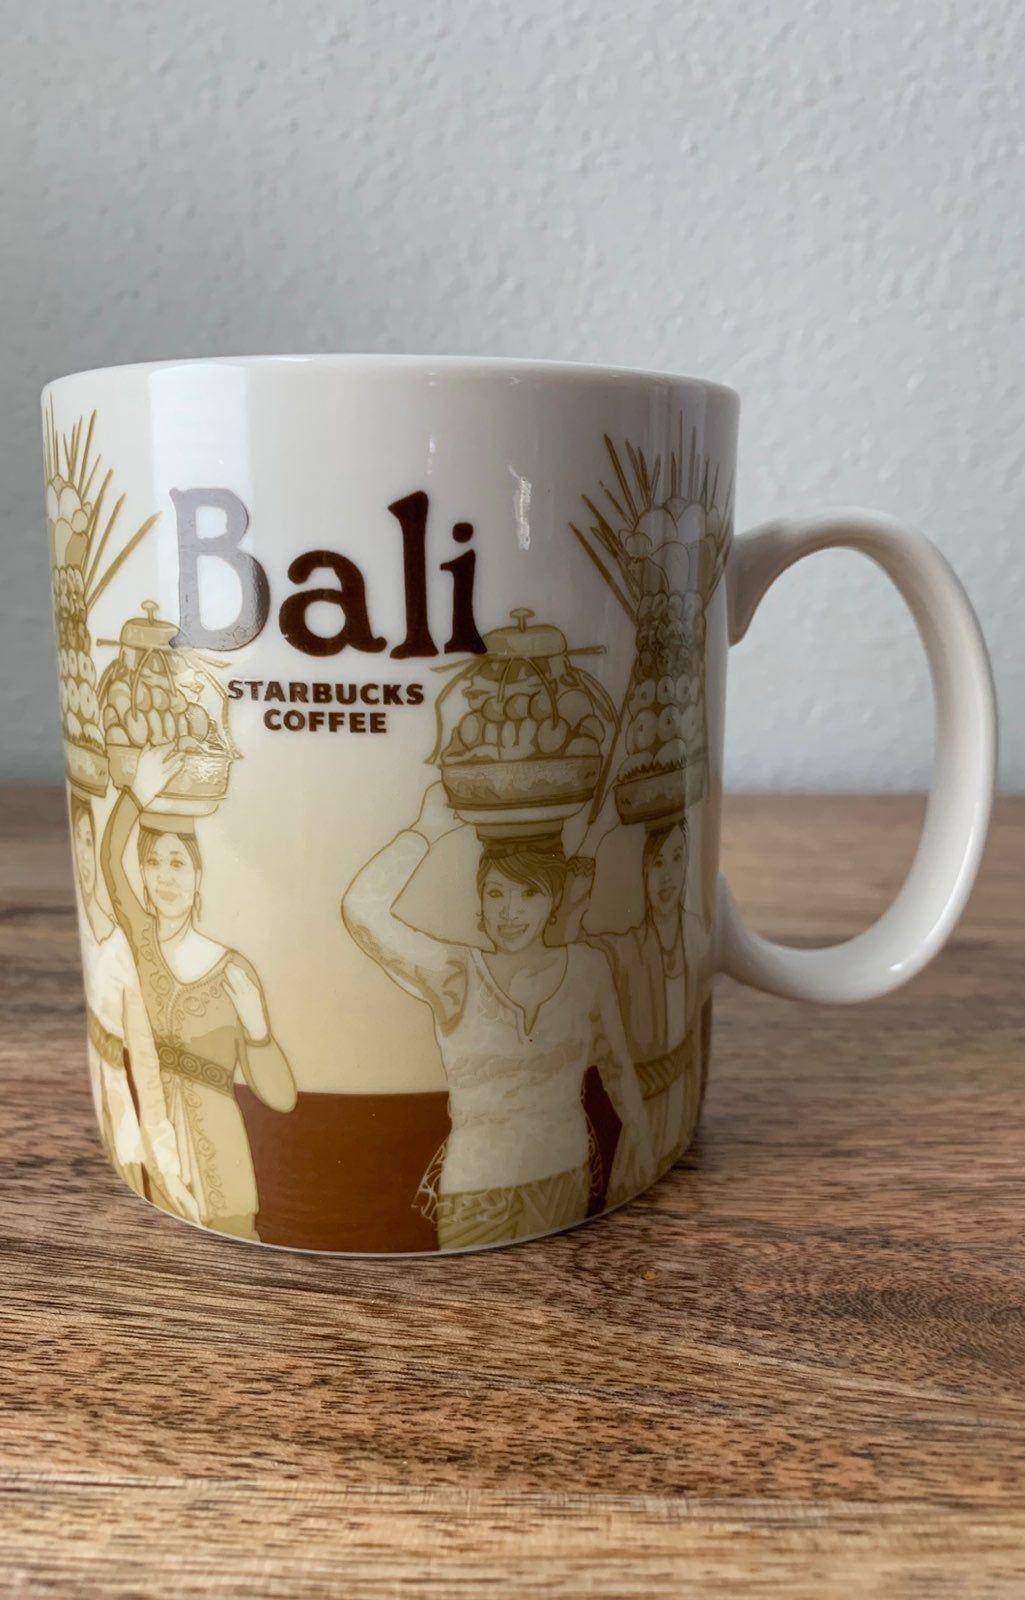 2012 Starbucks Coffee Cup Bali Indonesia Global Icon